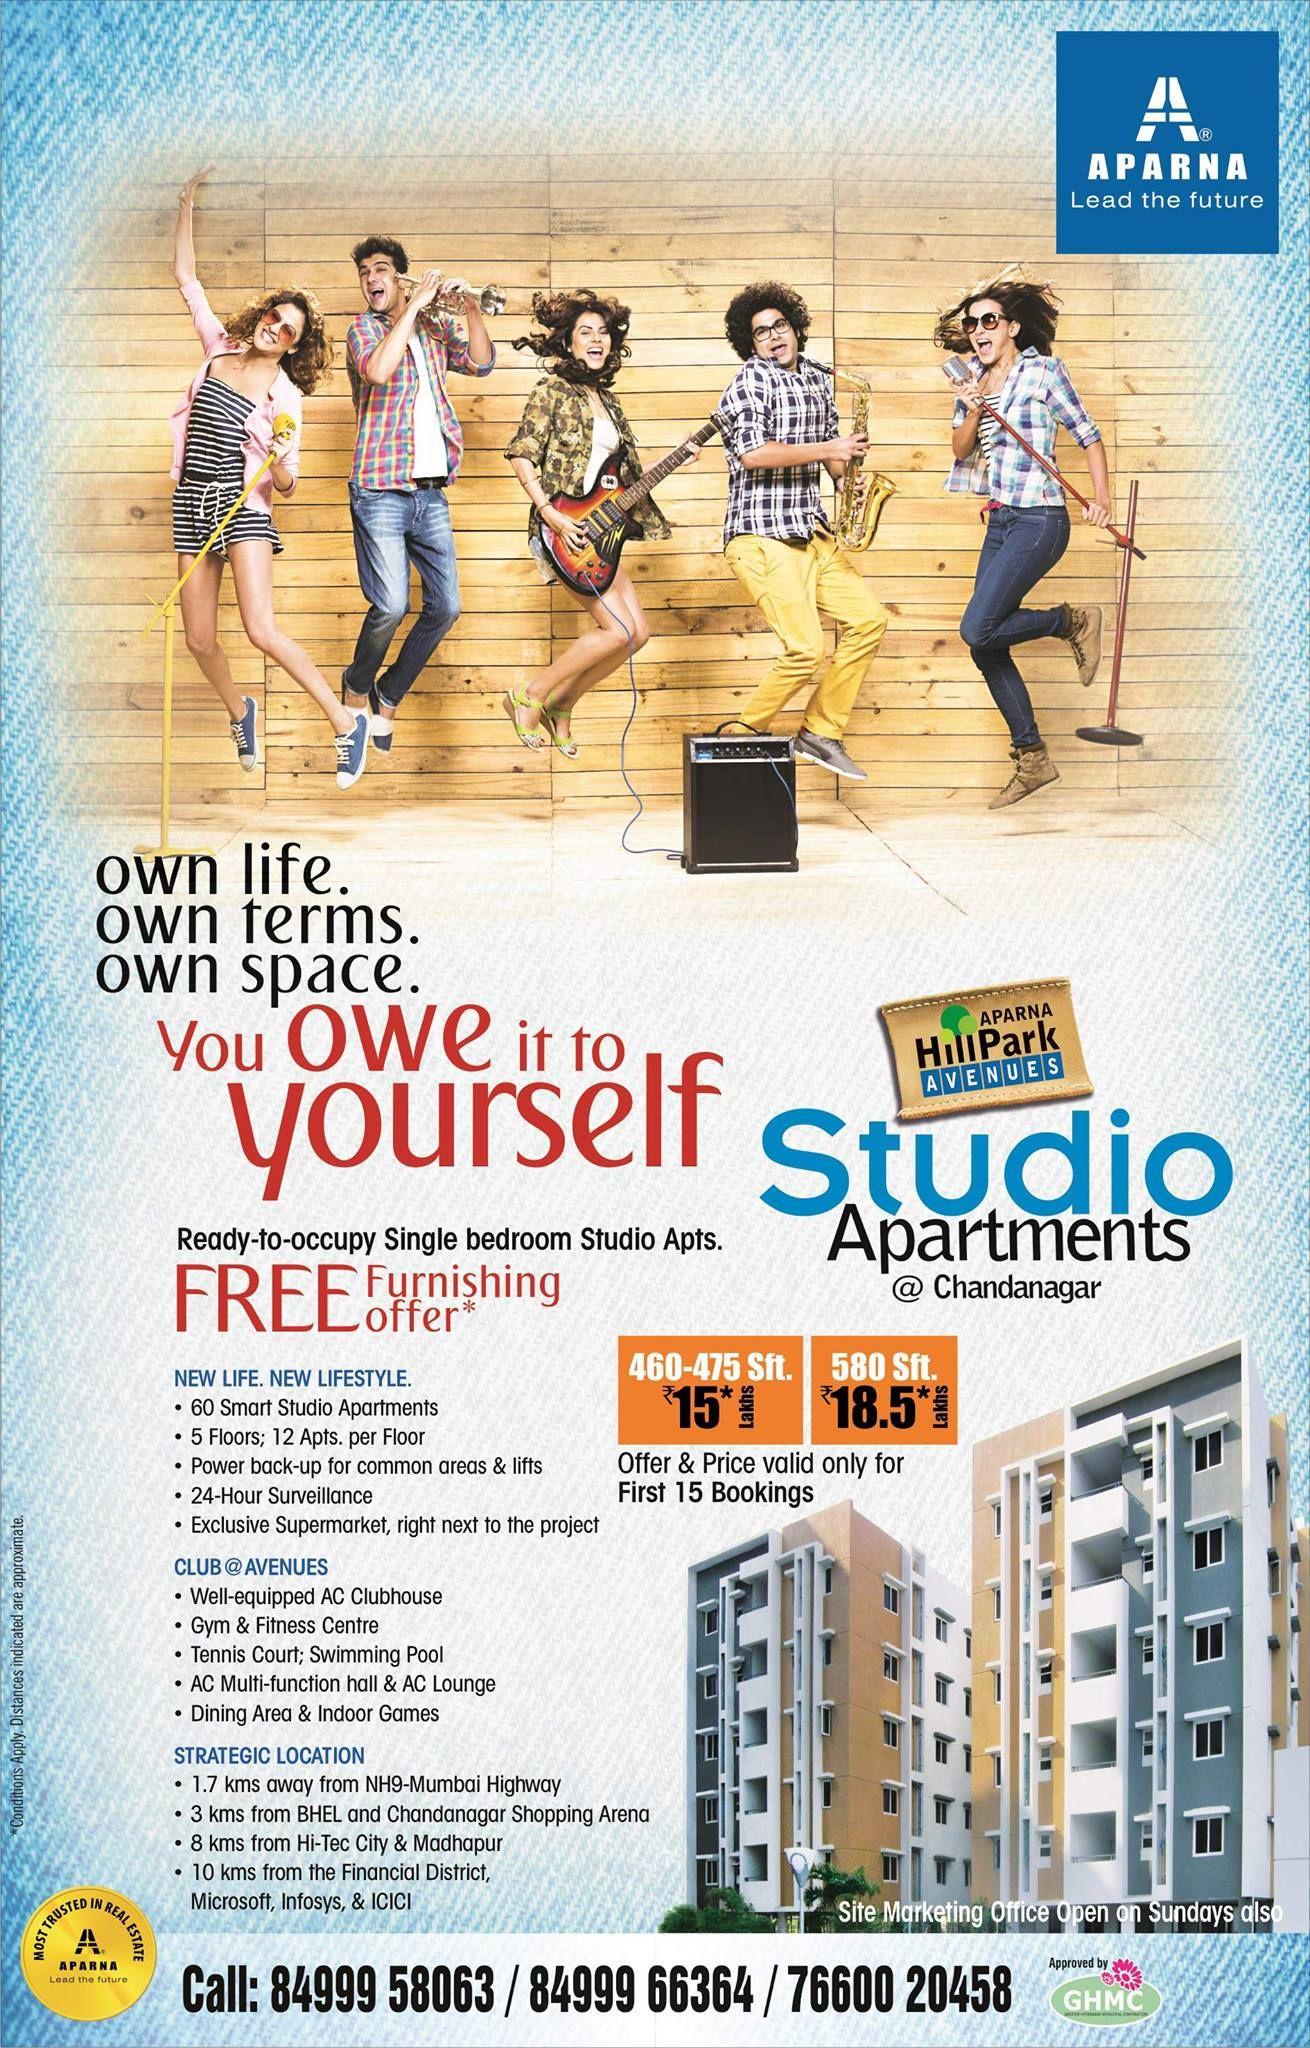 Aparna hillpark avenues studio apartments gated